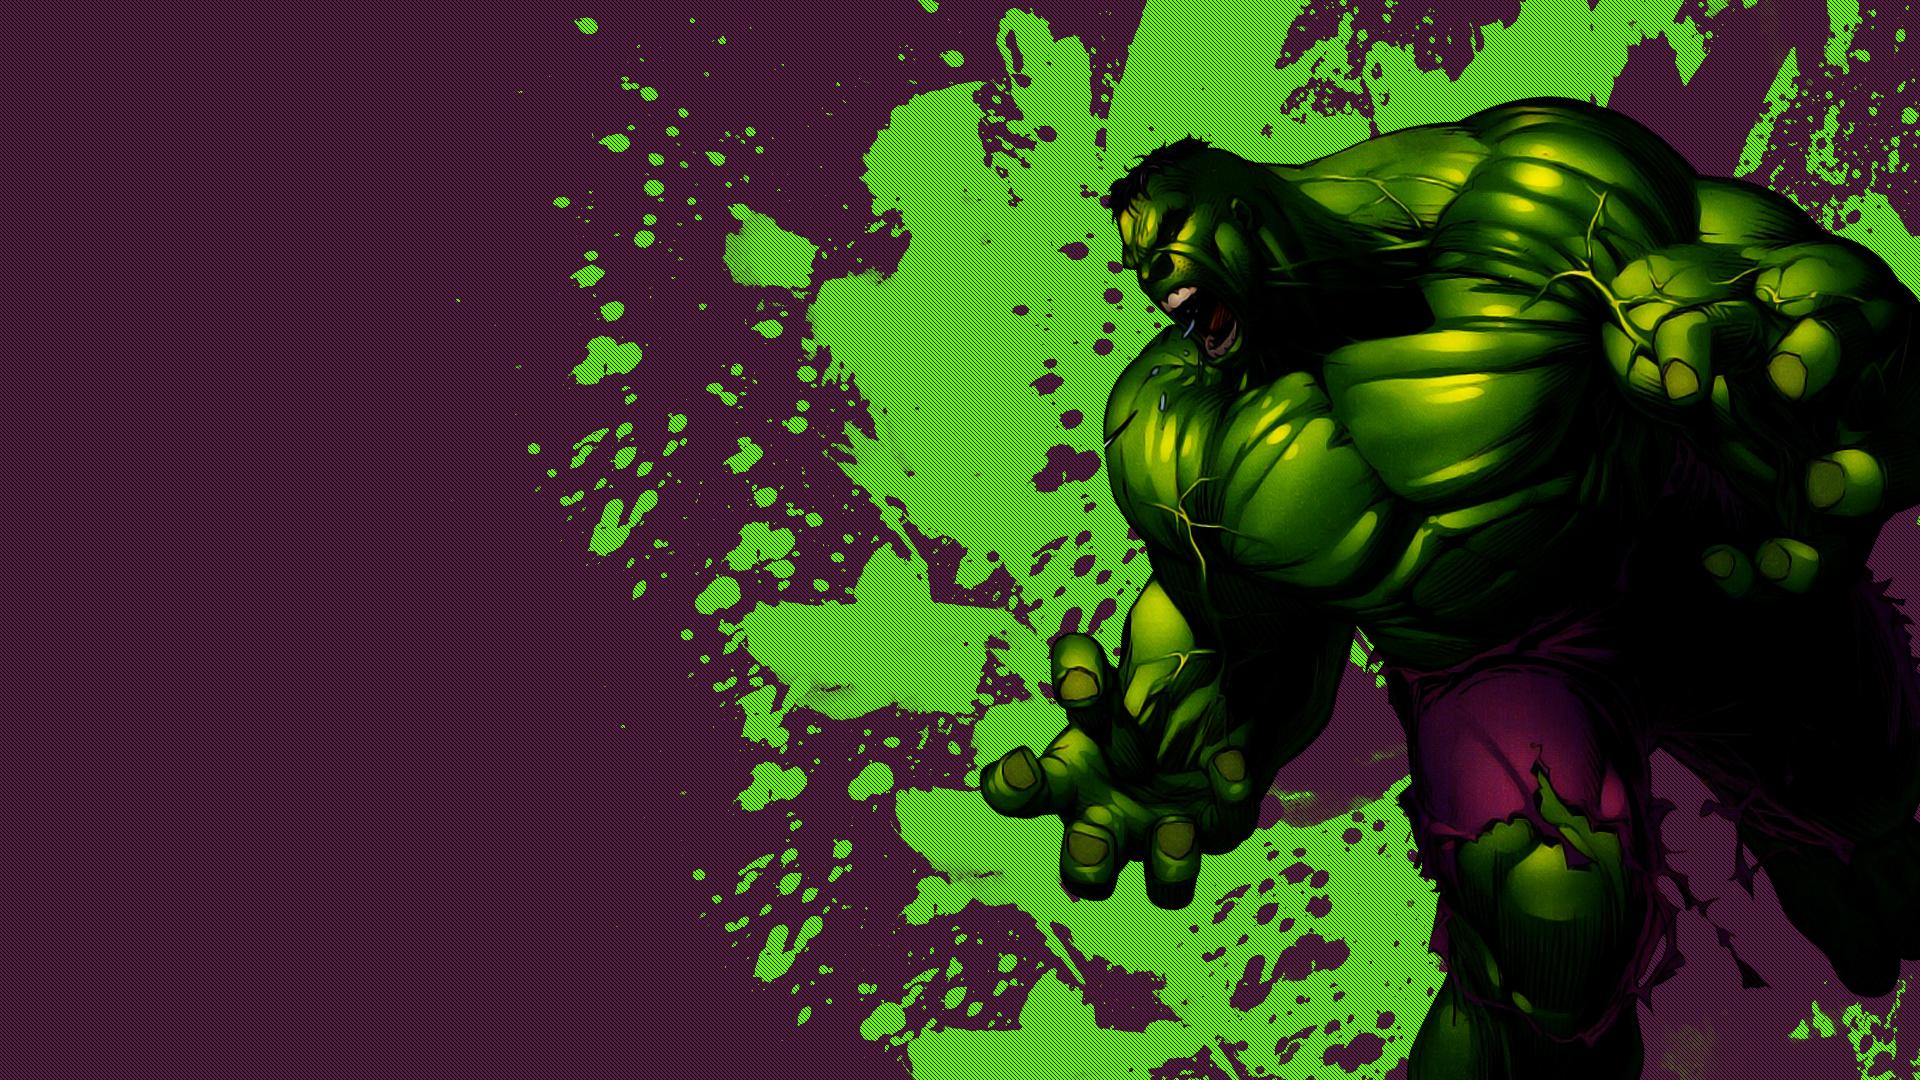 Incredible Hulk Wallpaper For Desktop HD Windows Wallpapers HD 1920x1080